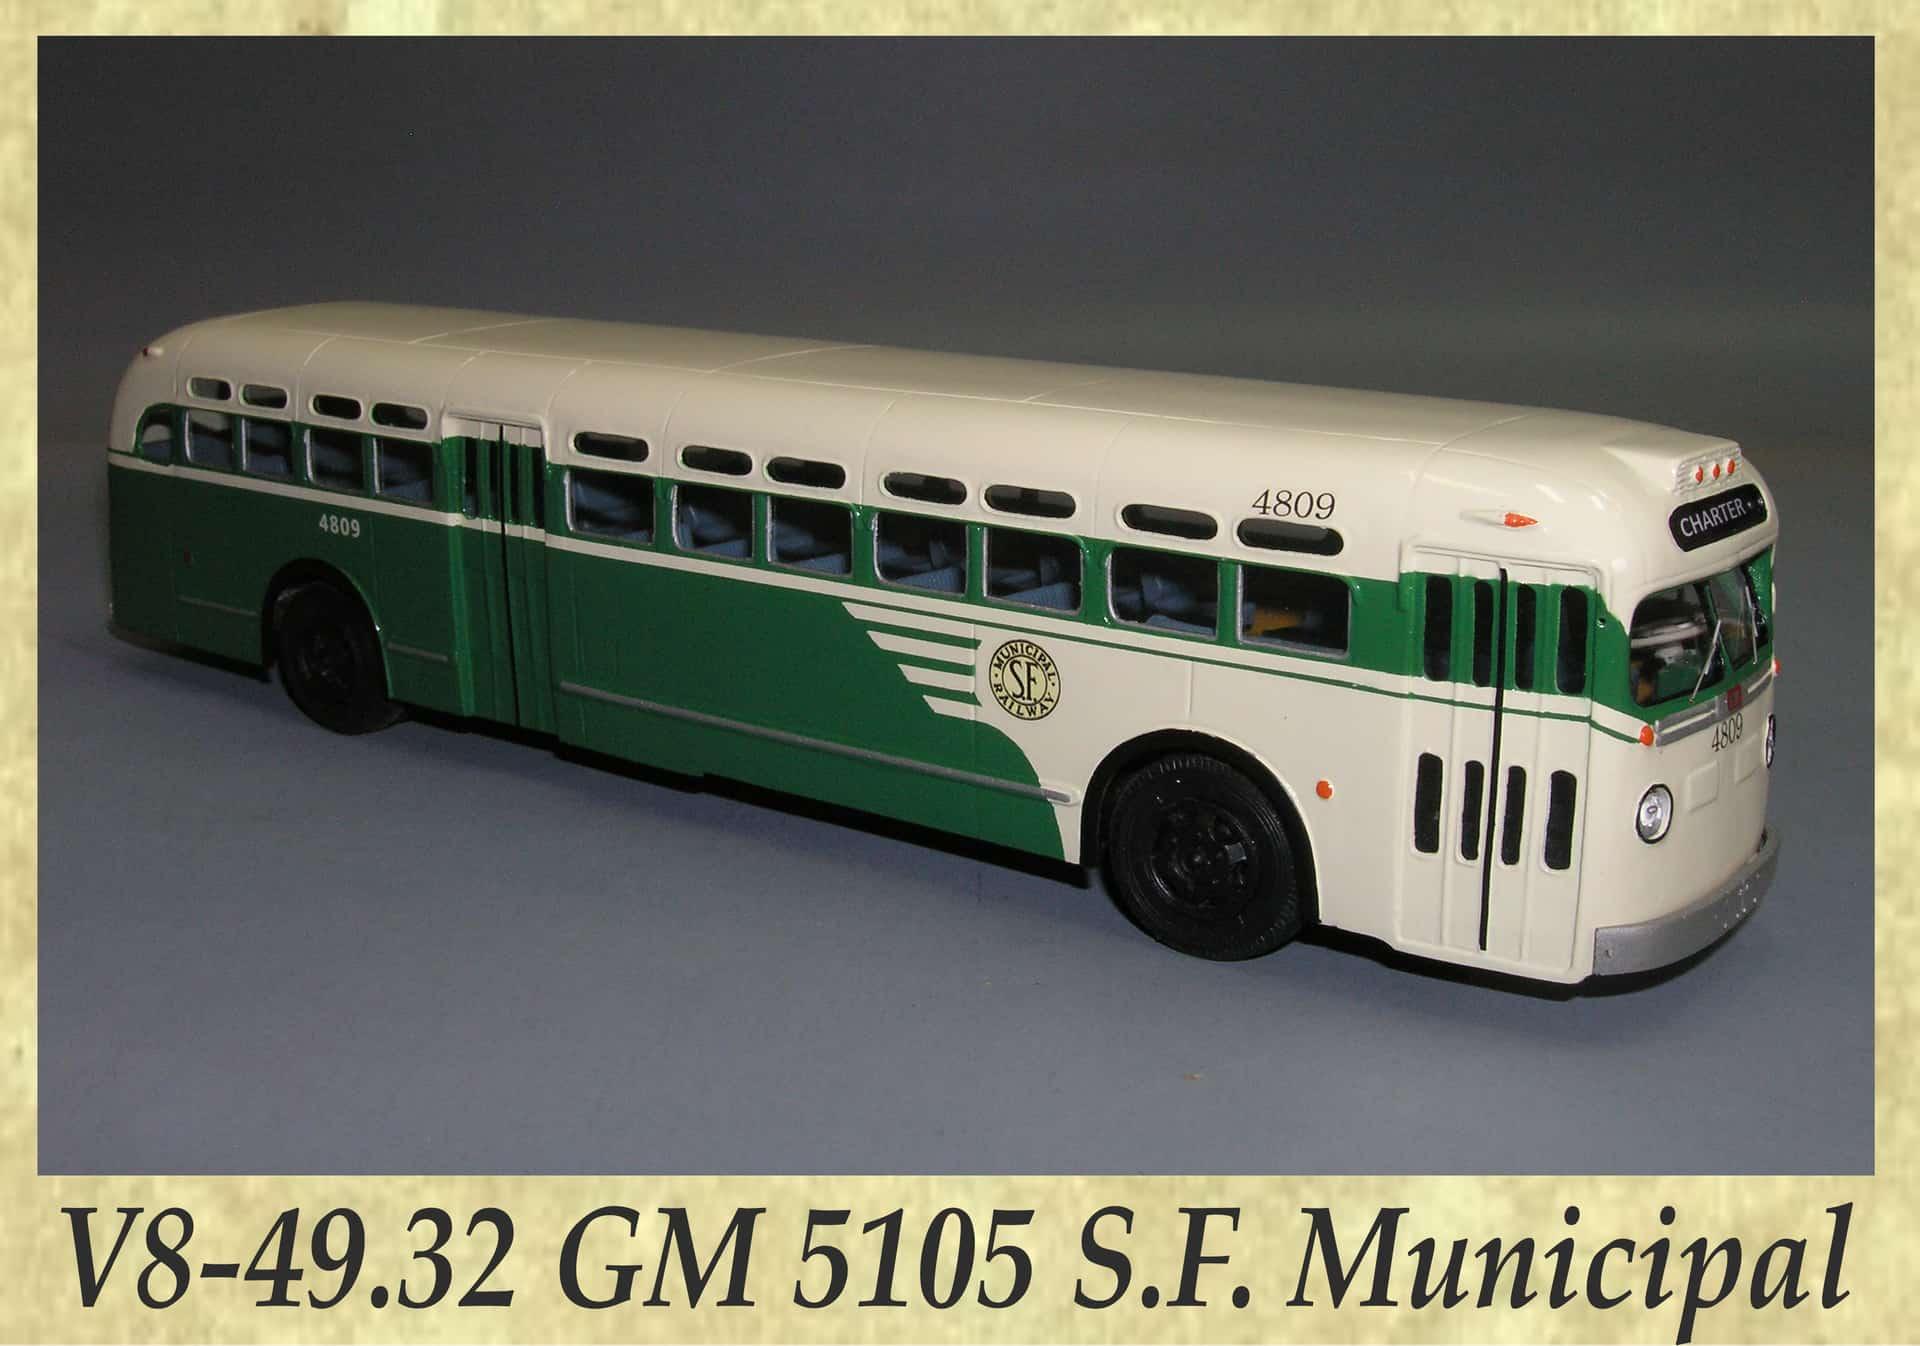 V8-49.32 GM 5105 S.F. Municipal